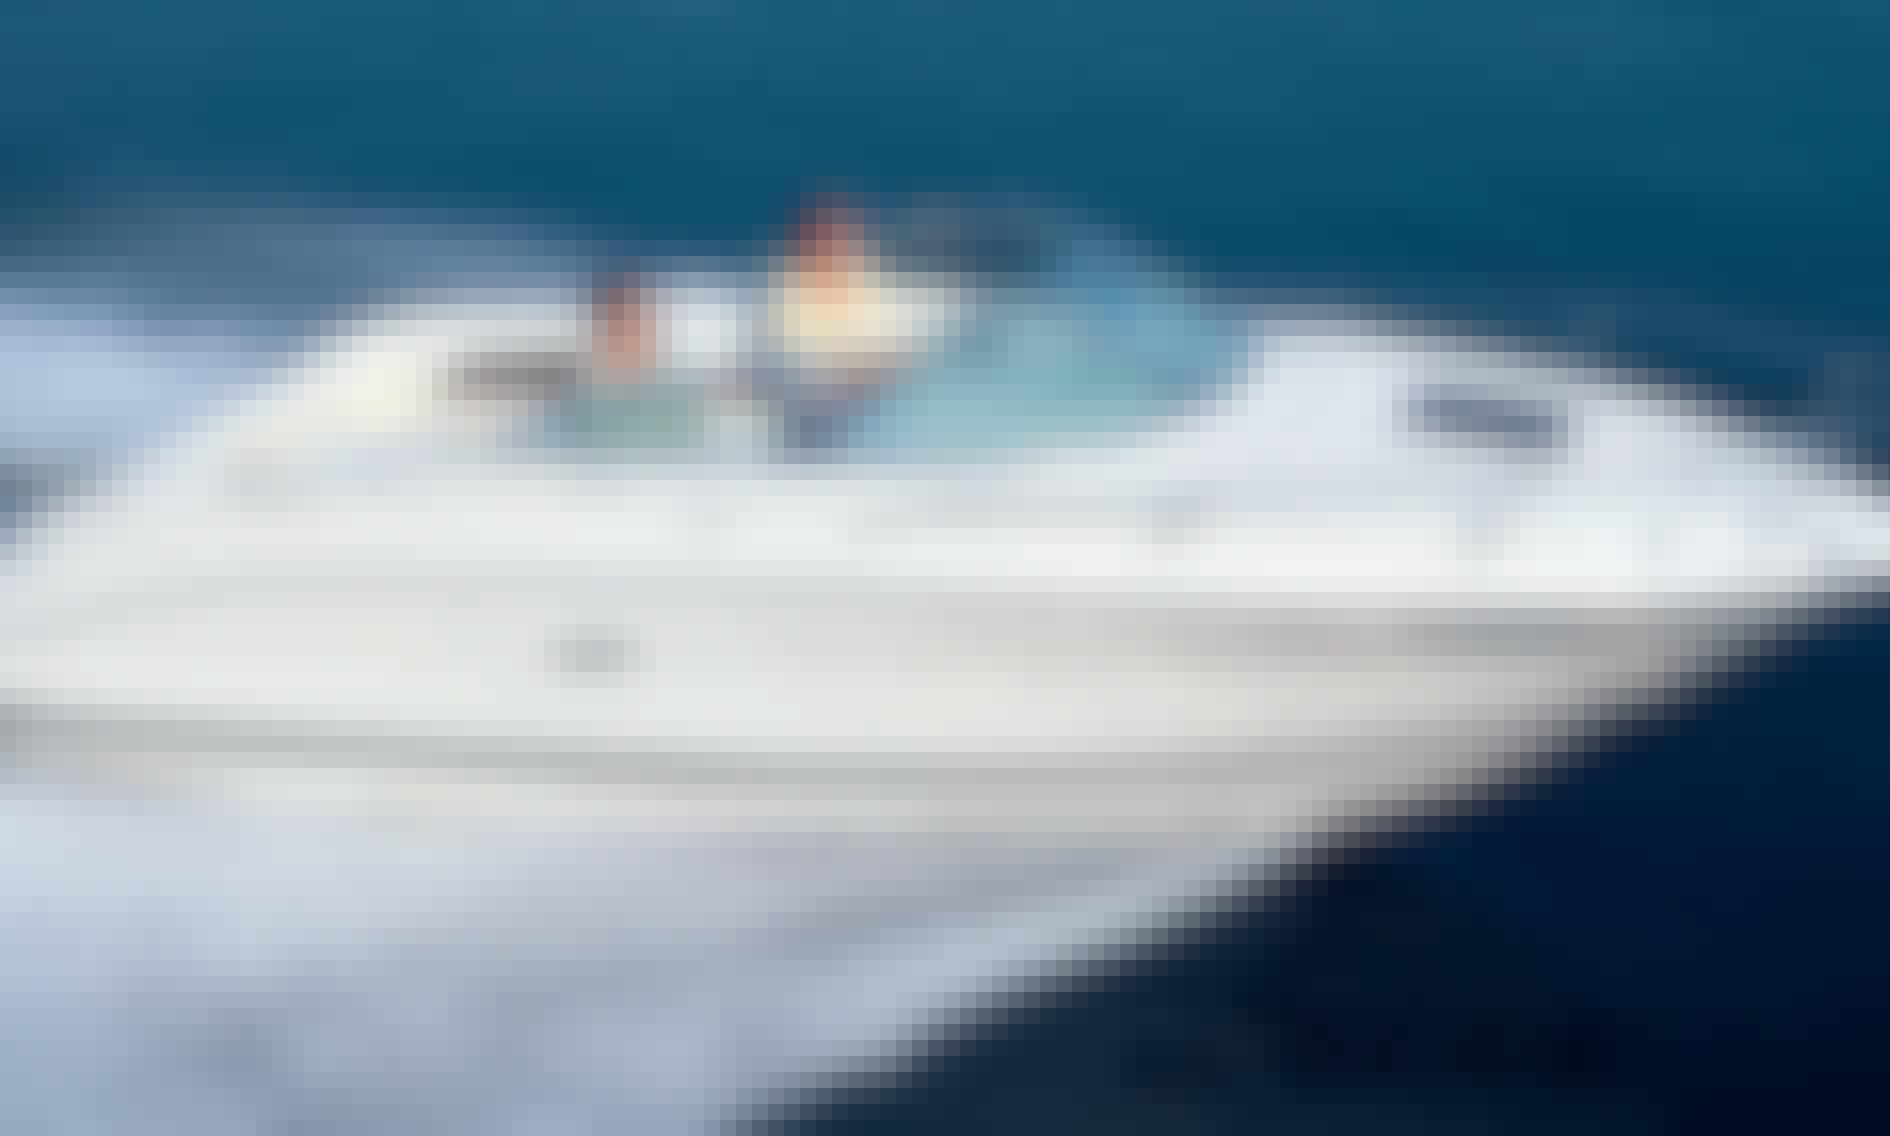 Sniper Searay Weekender Speedboat in Chania